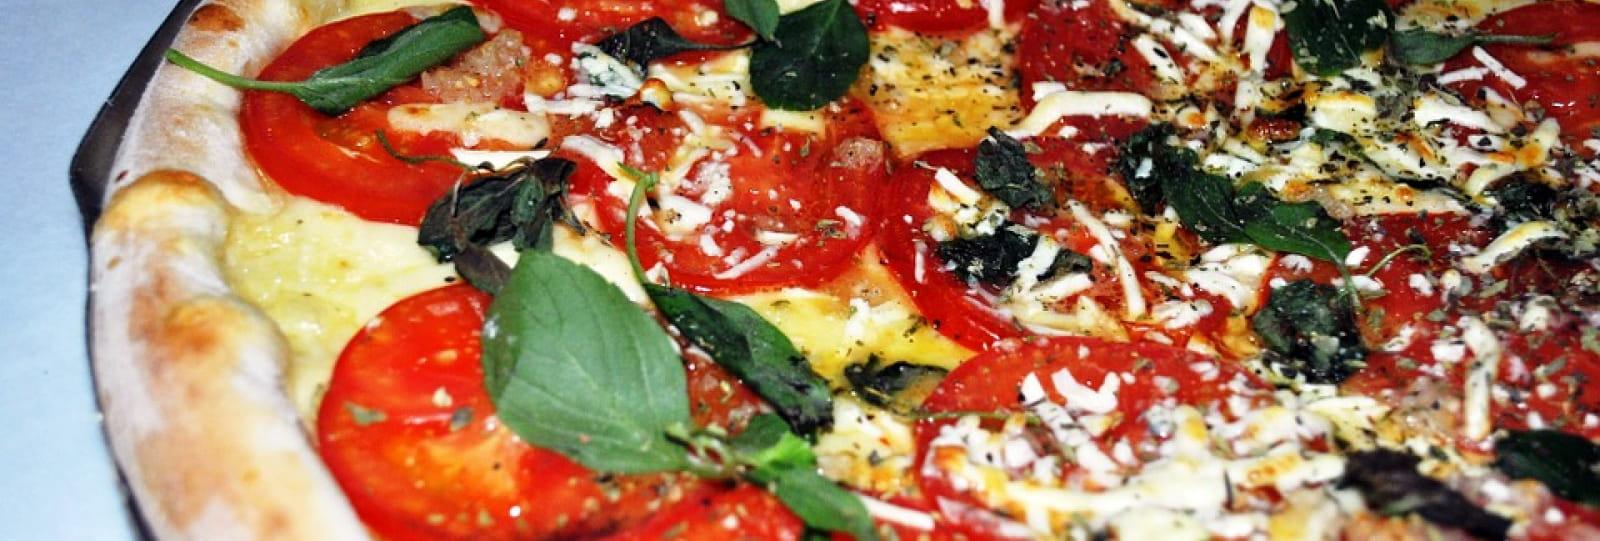 Gi Joe pizza_Saint Donat